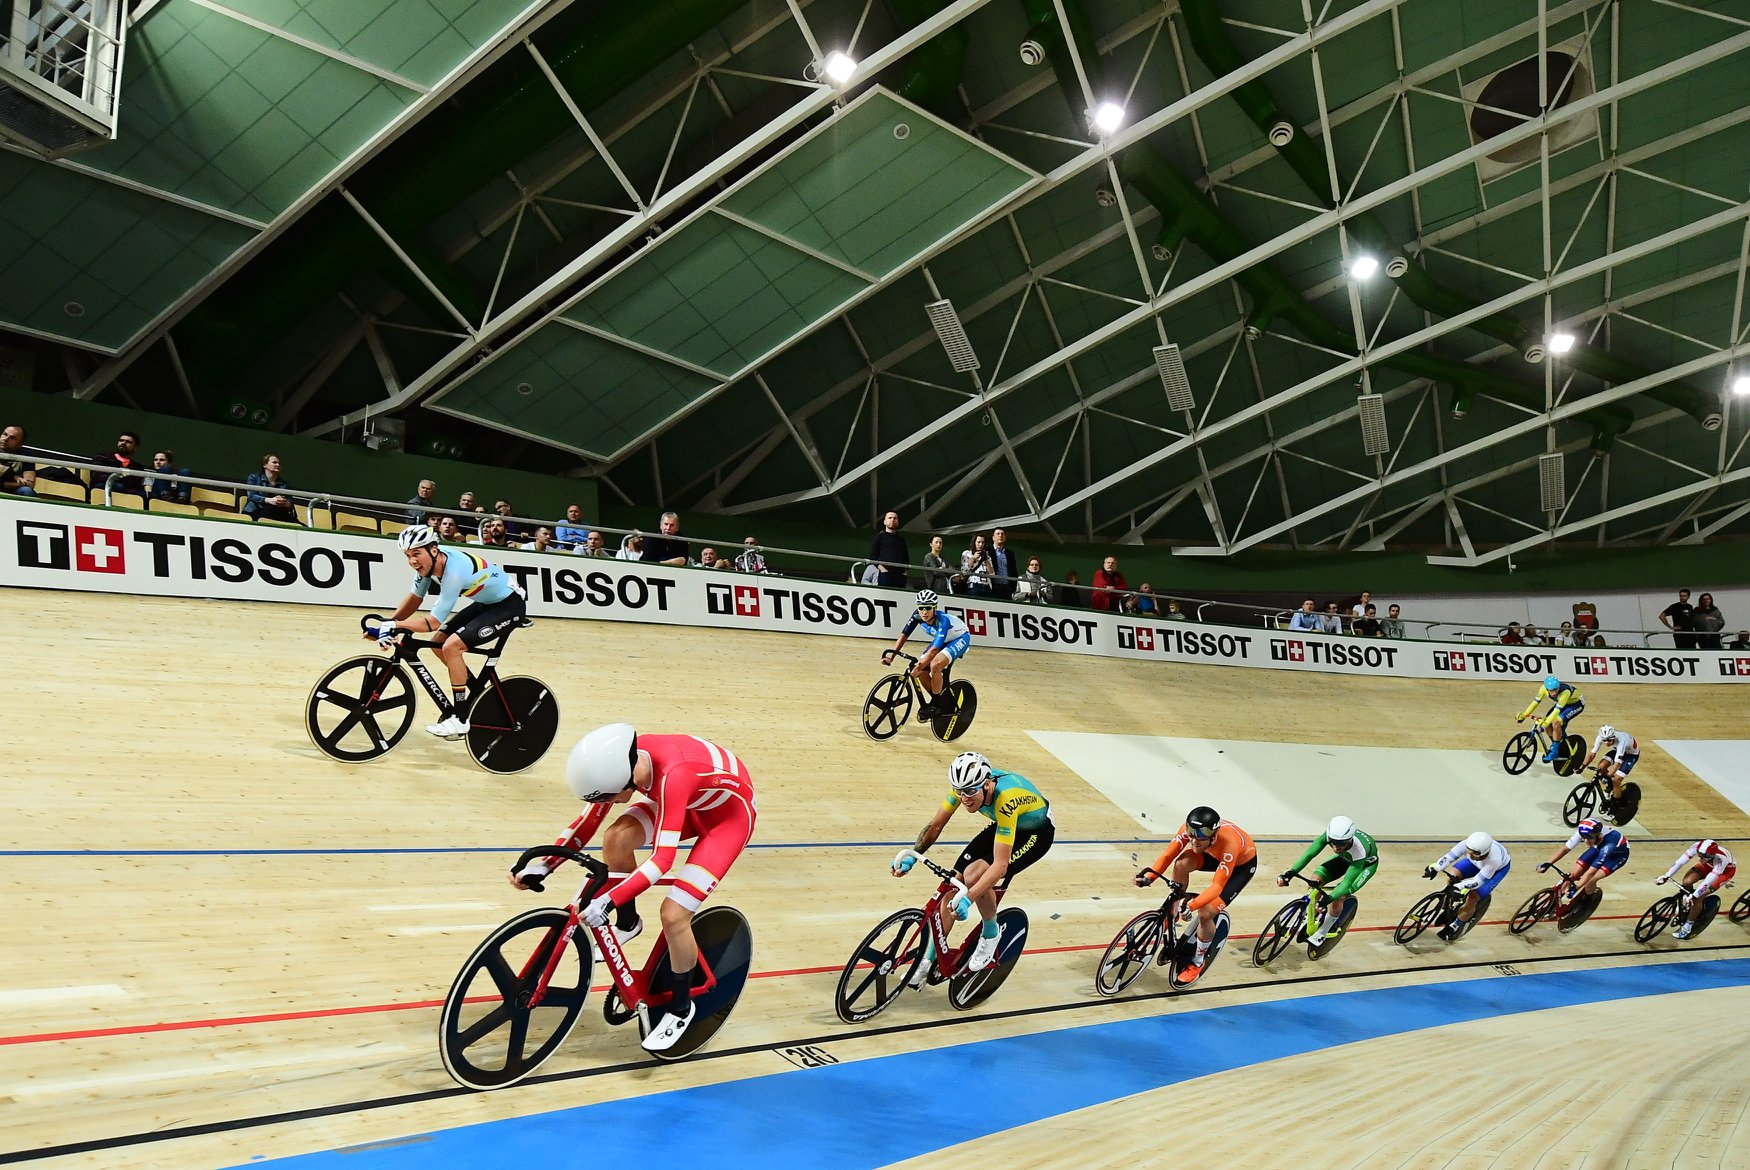 World Cup 2020 Calendar.Capovelo Com Uci Announces 2019 2020 Track Cycling World Cup Calendar